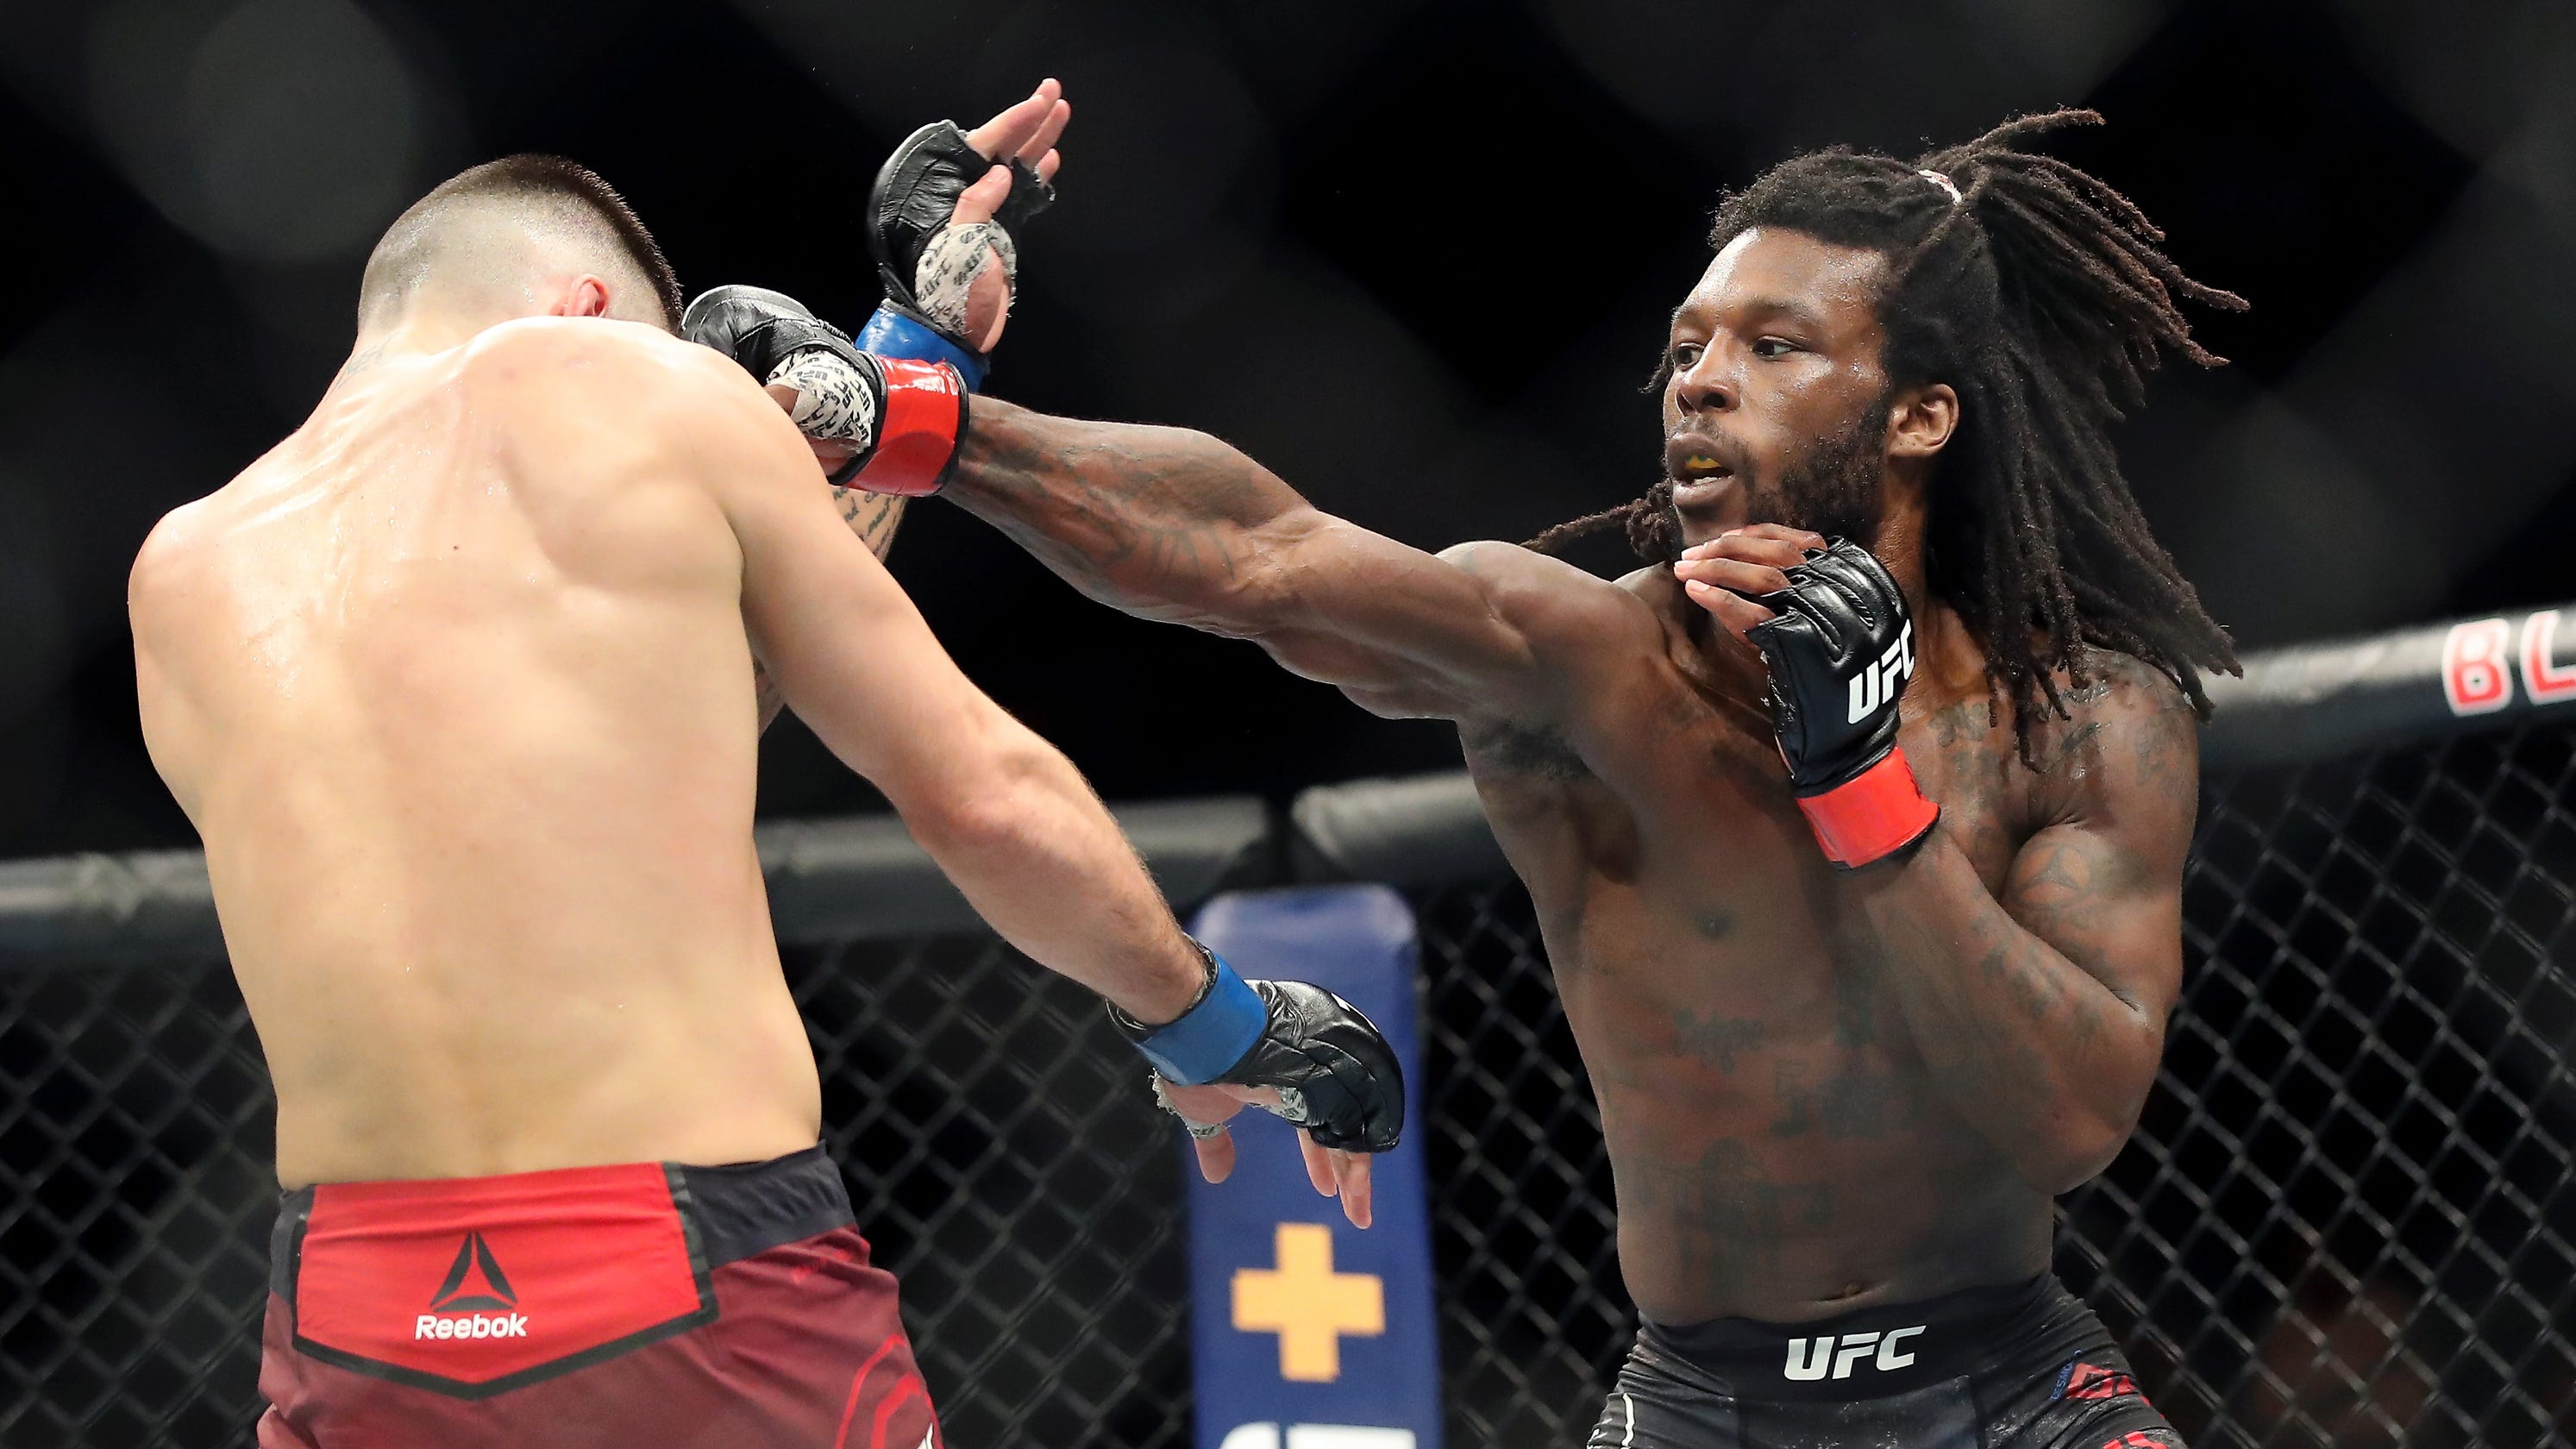 UFC lightweight Desmond Green jailed on 20 charges after deadly crash